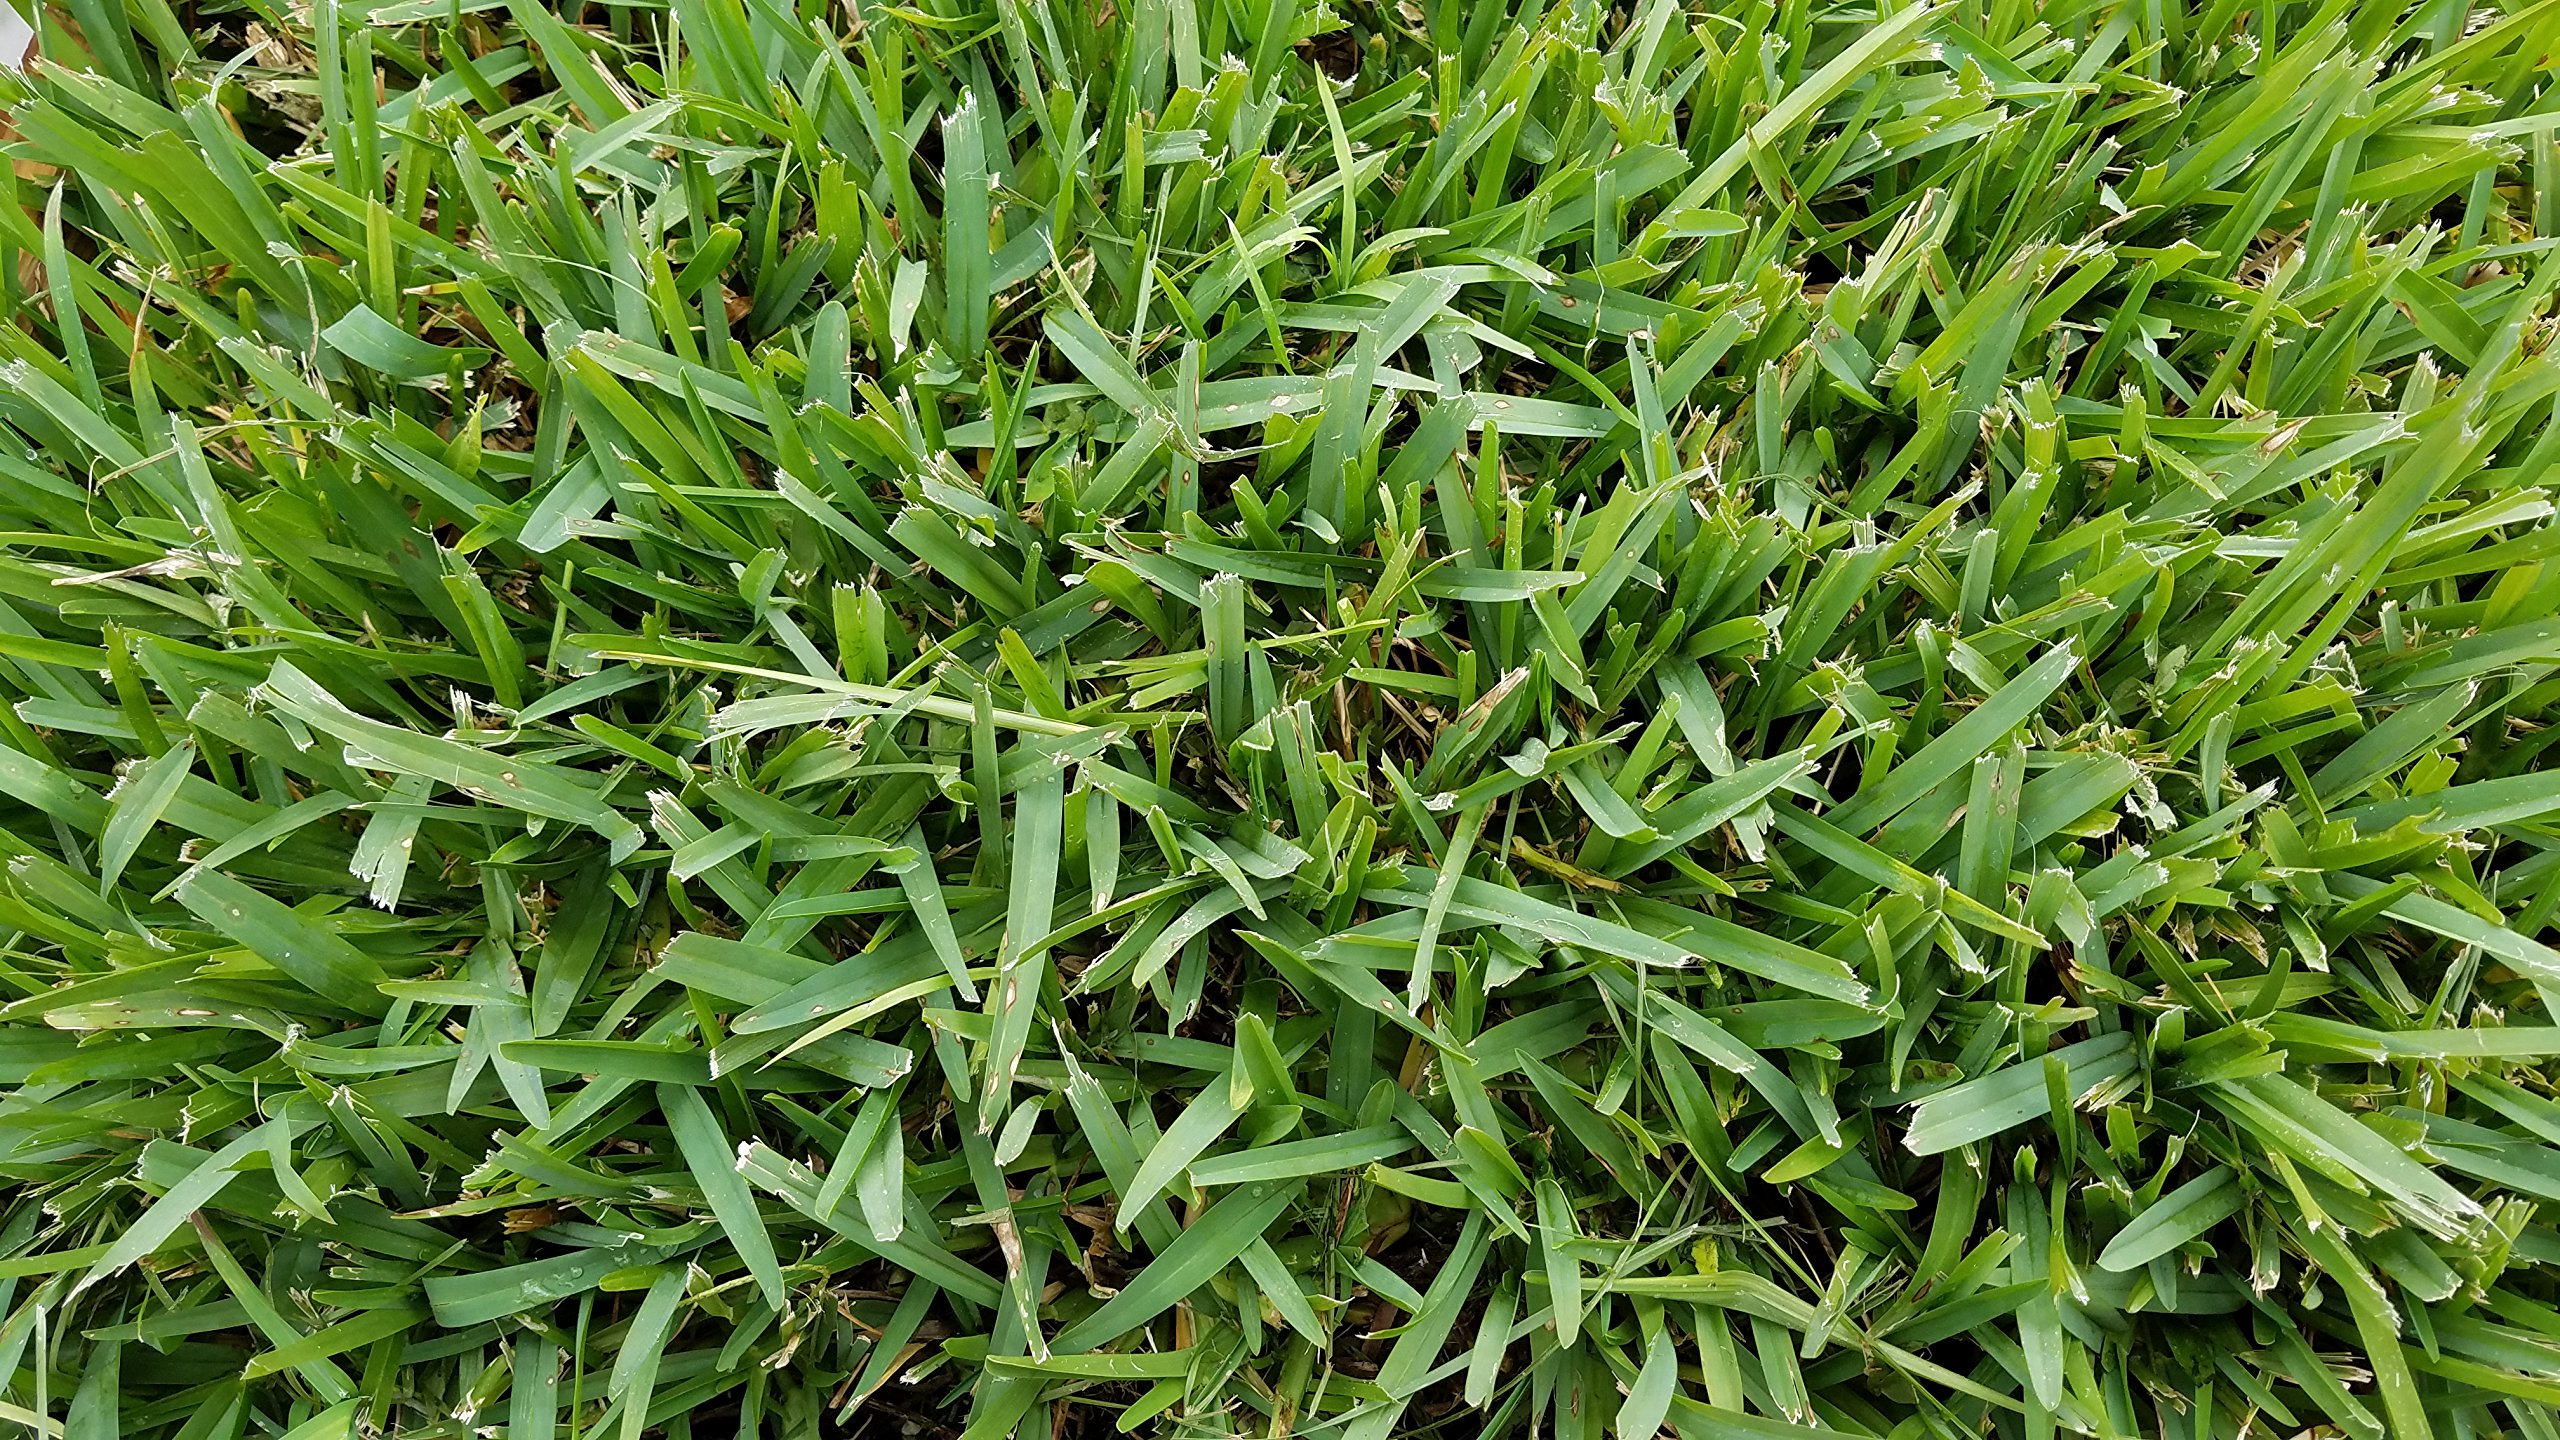 Gulf Kist 'Classic' St Augustine Grass Plugs - 36 Count